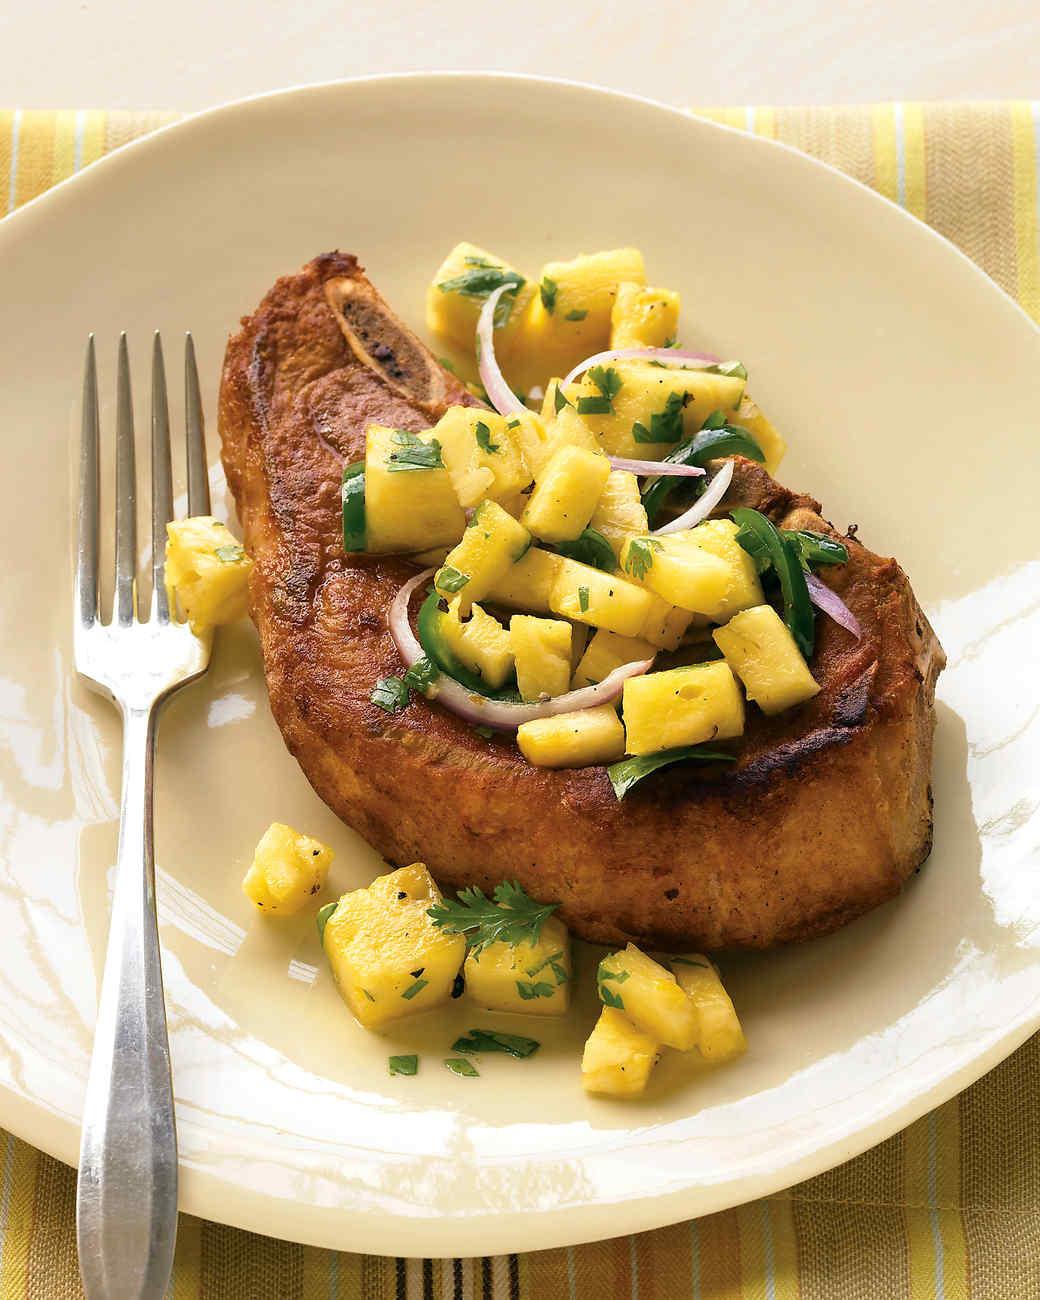 Pork Chop with Pineapple Salsa